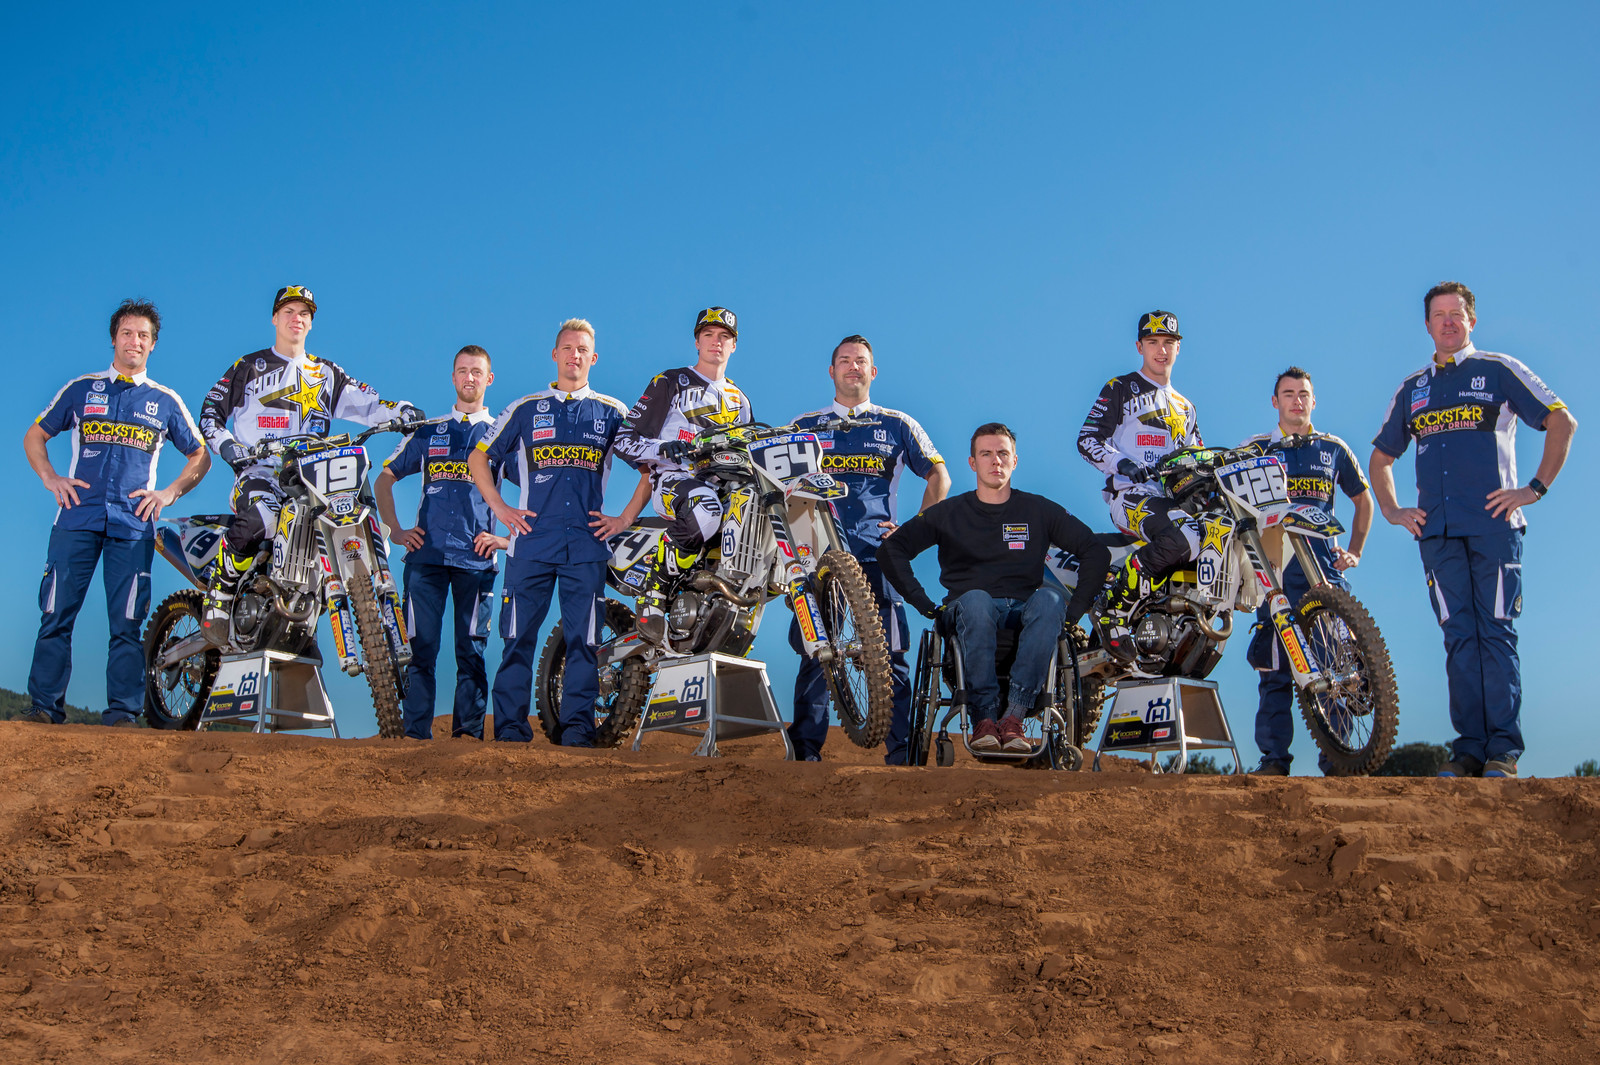 Rockstar Energy Husqvarna Factory Racing MX2 Team  - Rockstar Energy Racing Husqvarna's MX2 Squad - Motocross Pictures - Vital MX